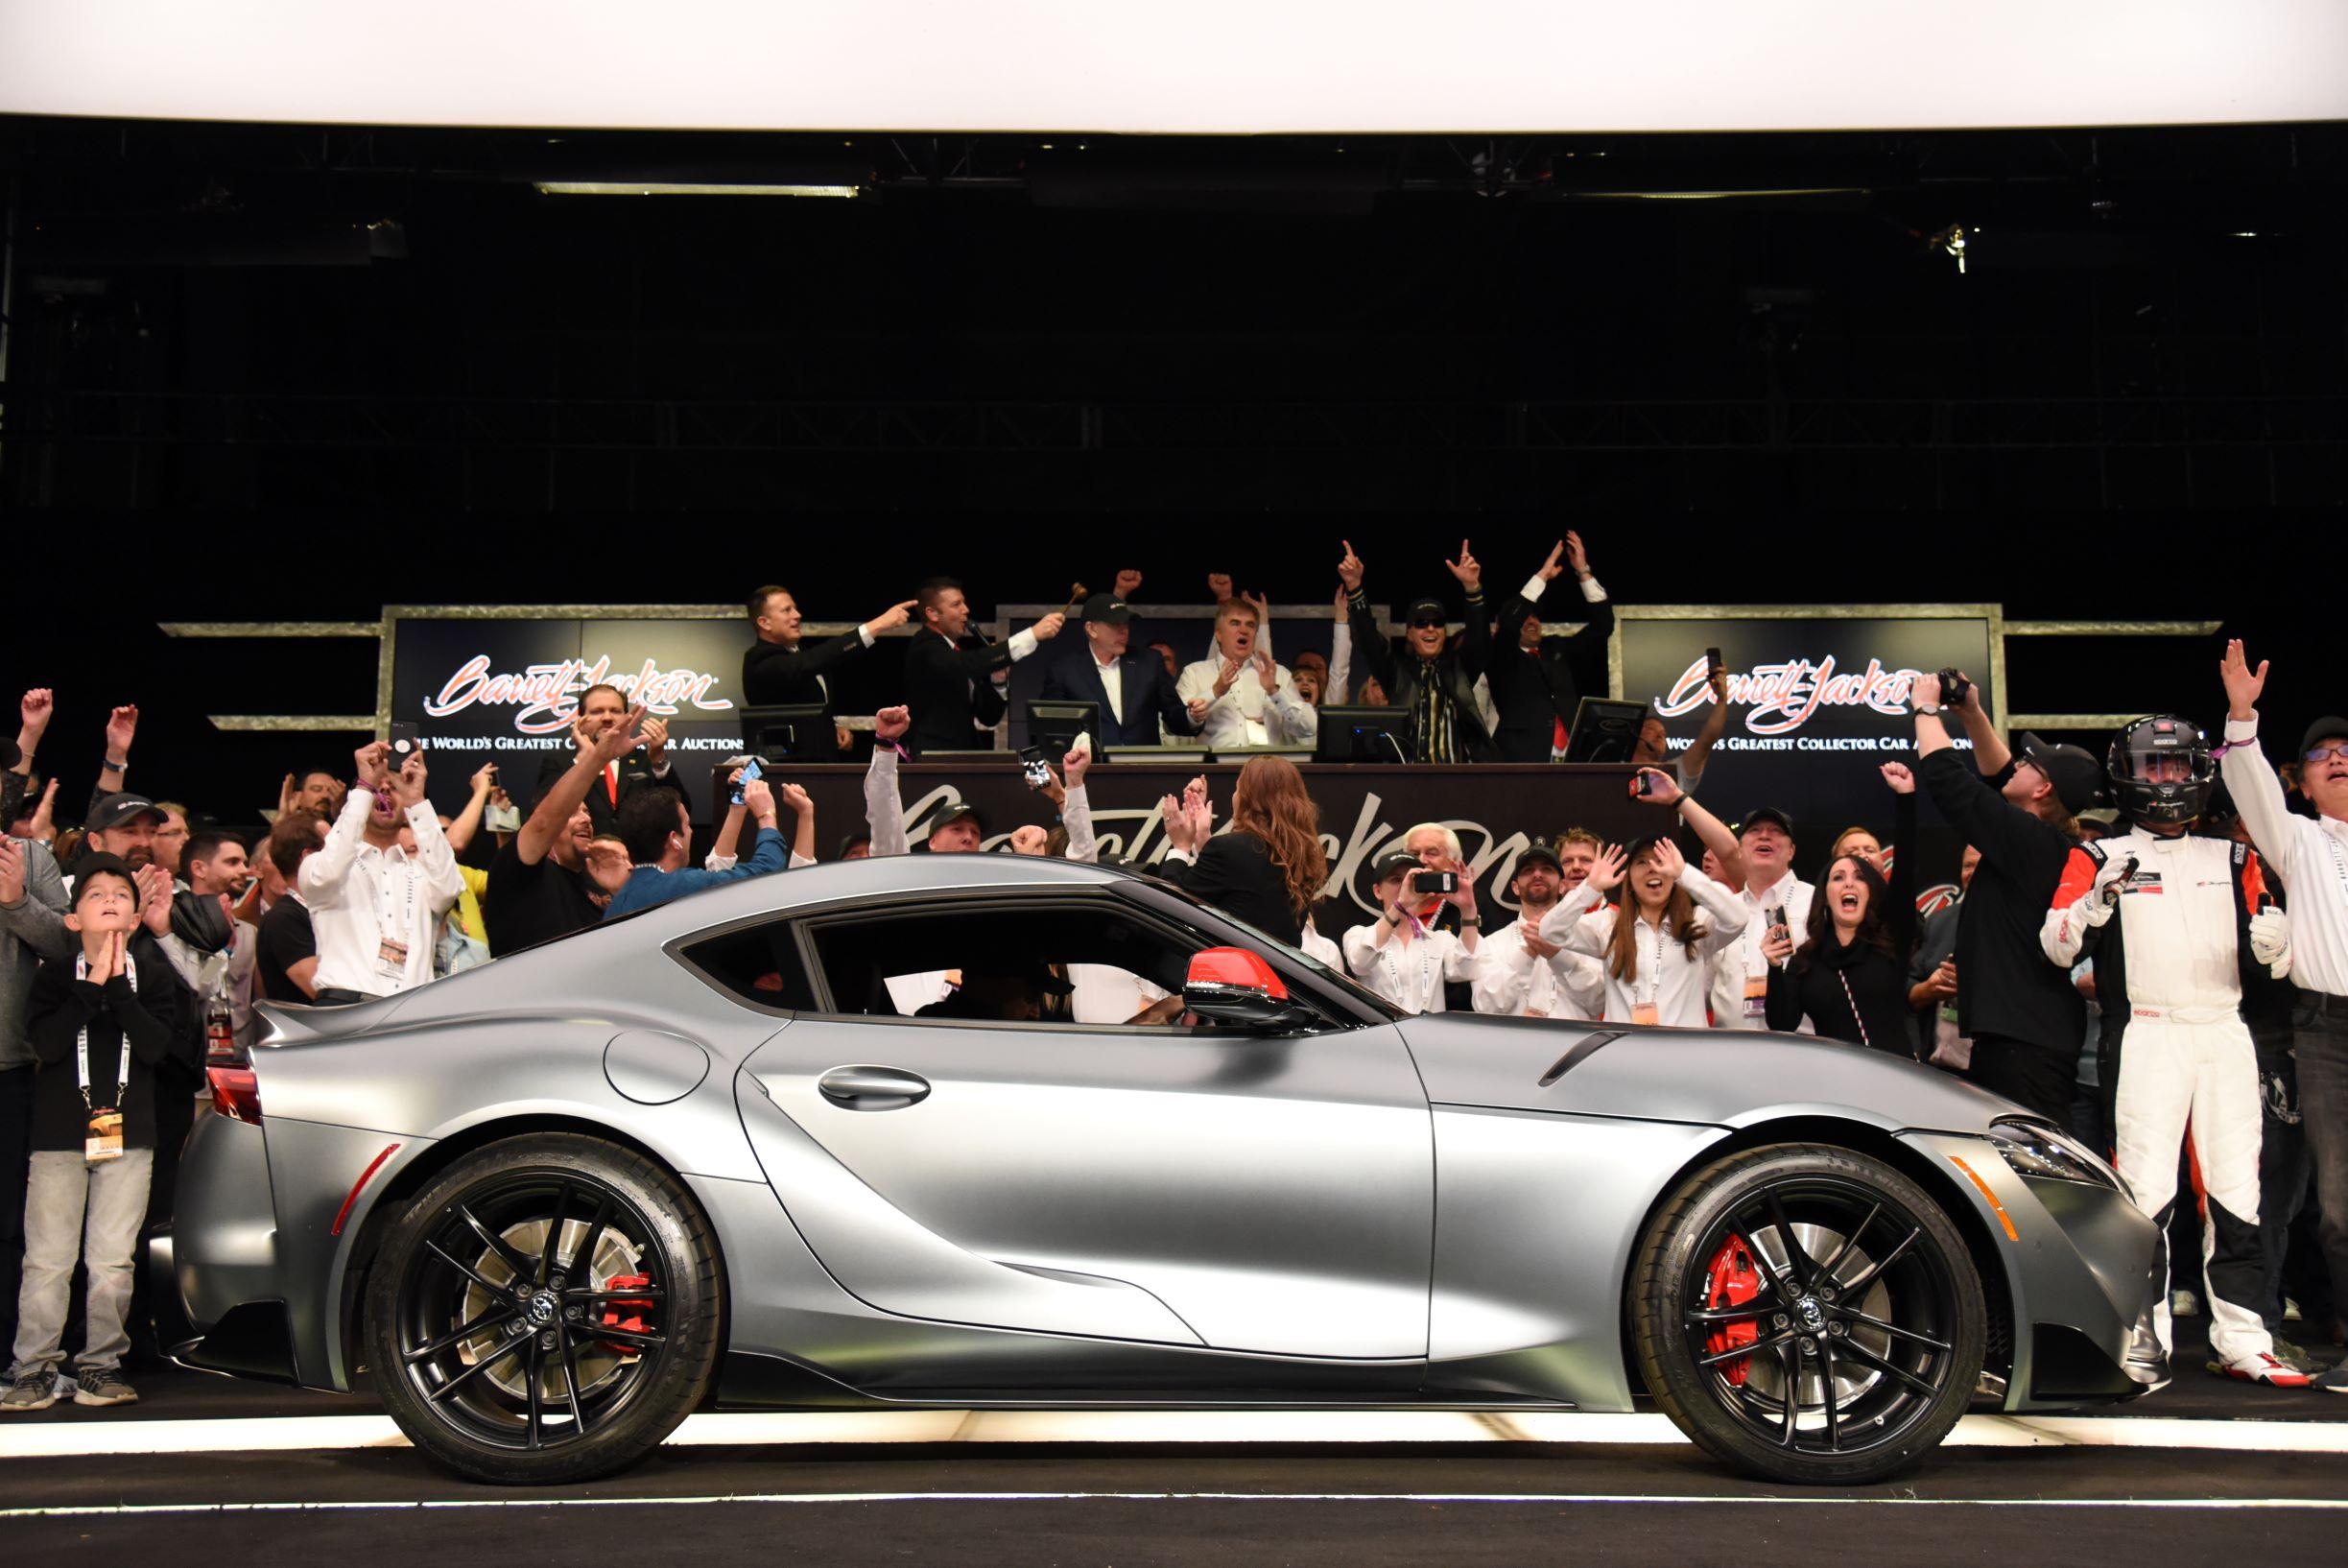 2020 Toyota Supra VIN 20201 (Lot #3010), which raised $2.1 million to benefit the American Heart Association and The Bob Woodruff Foundationk - Barrett-Jackson Scottsdale